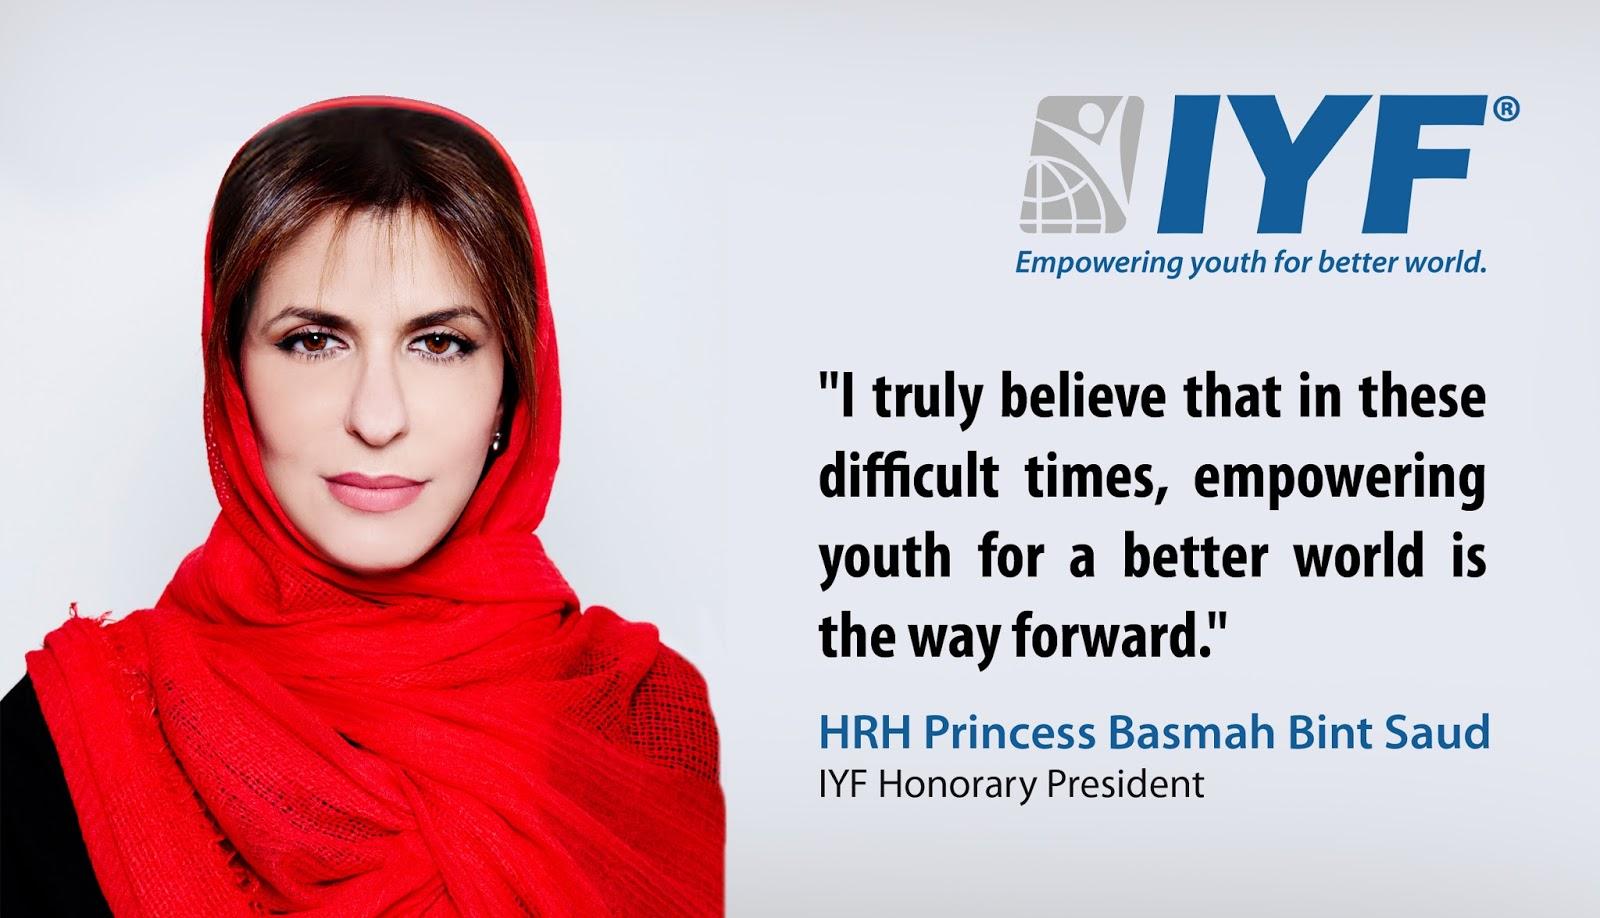 HRH Princess Basmah bint Saud, IYF Honorary President